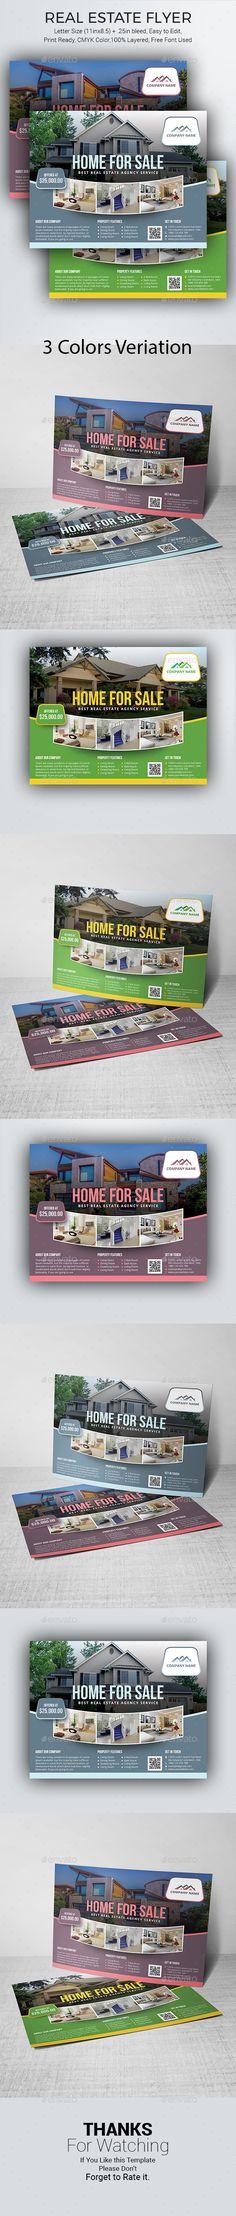 #Real Estate Flyer - #Commerce #Flyers